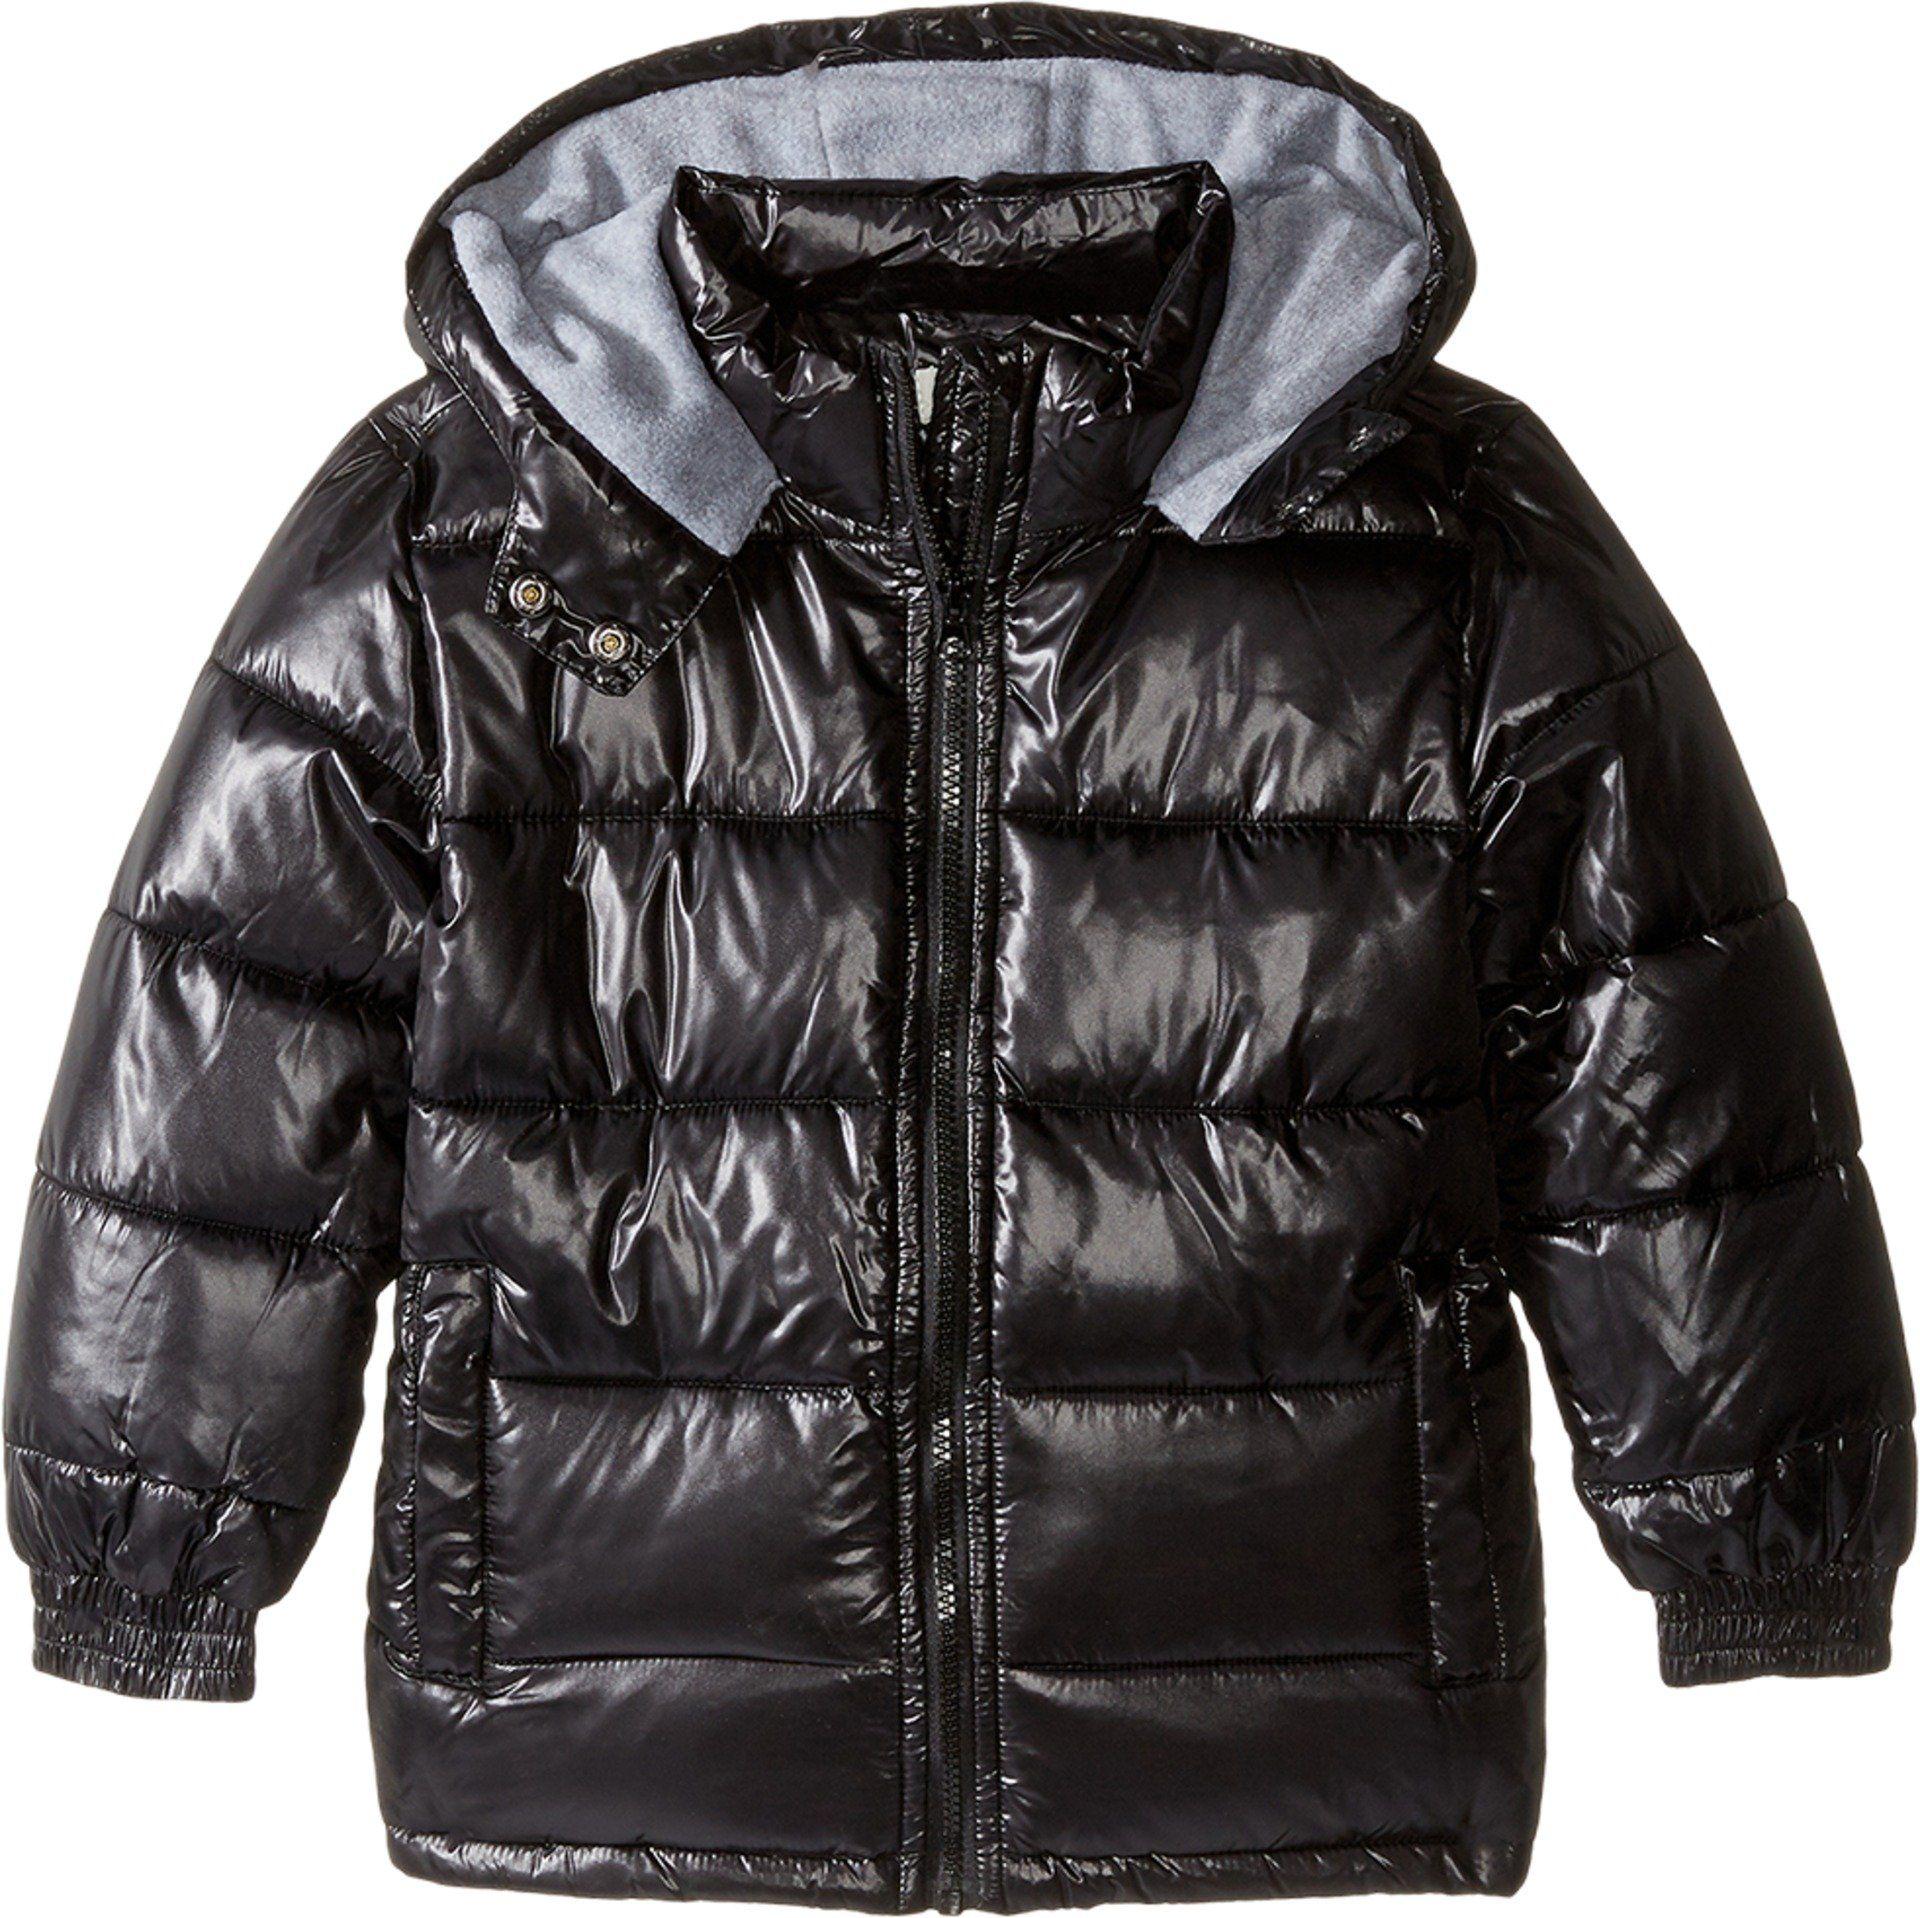 7f4a82388092 Pumpkin Patch Kids Baby Boy s High Shine Black Puffer Jacket (Infant ...